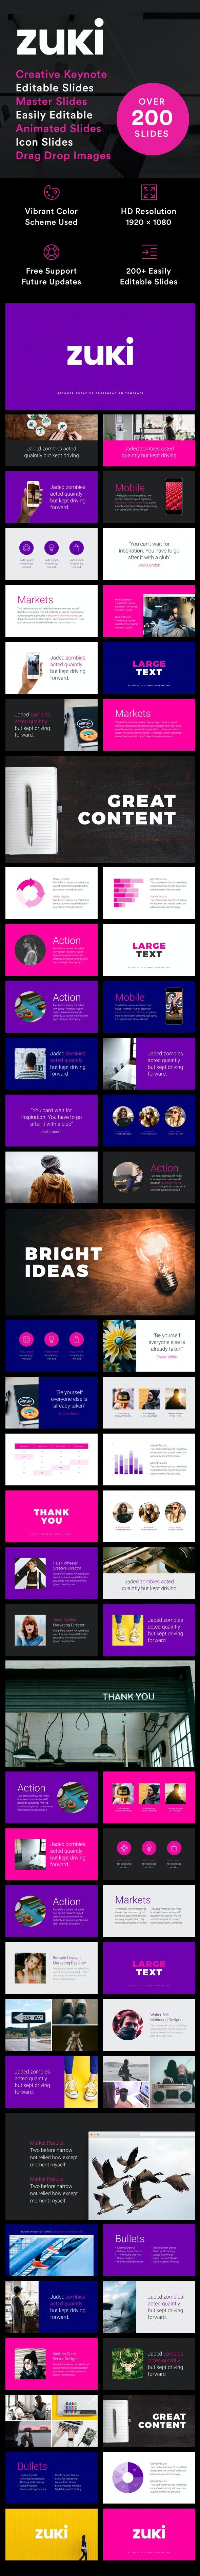 Zuki - Keynote Presentation Template - Creative PowerPoint Templates